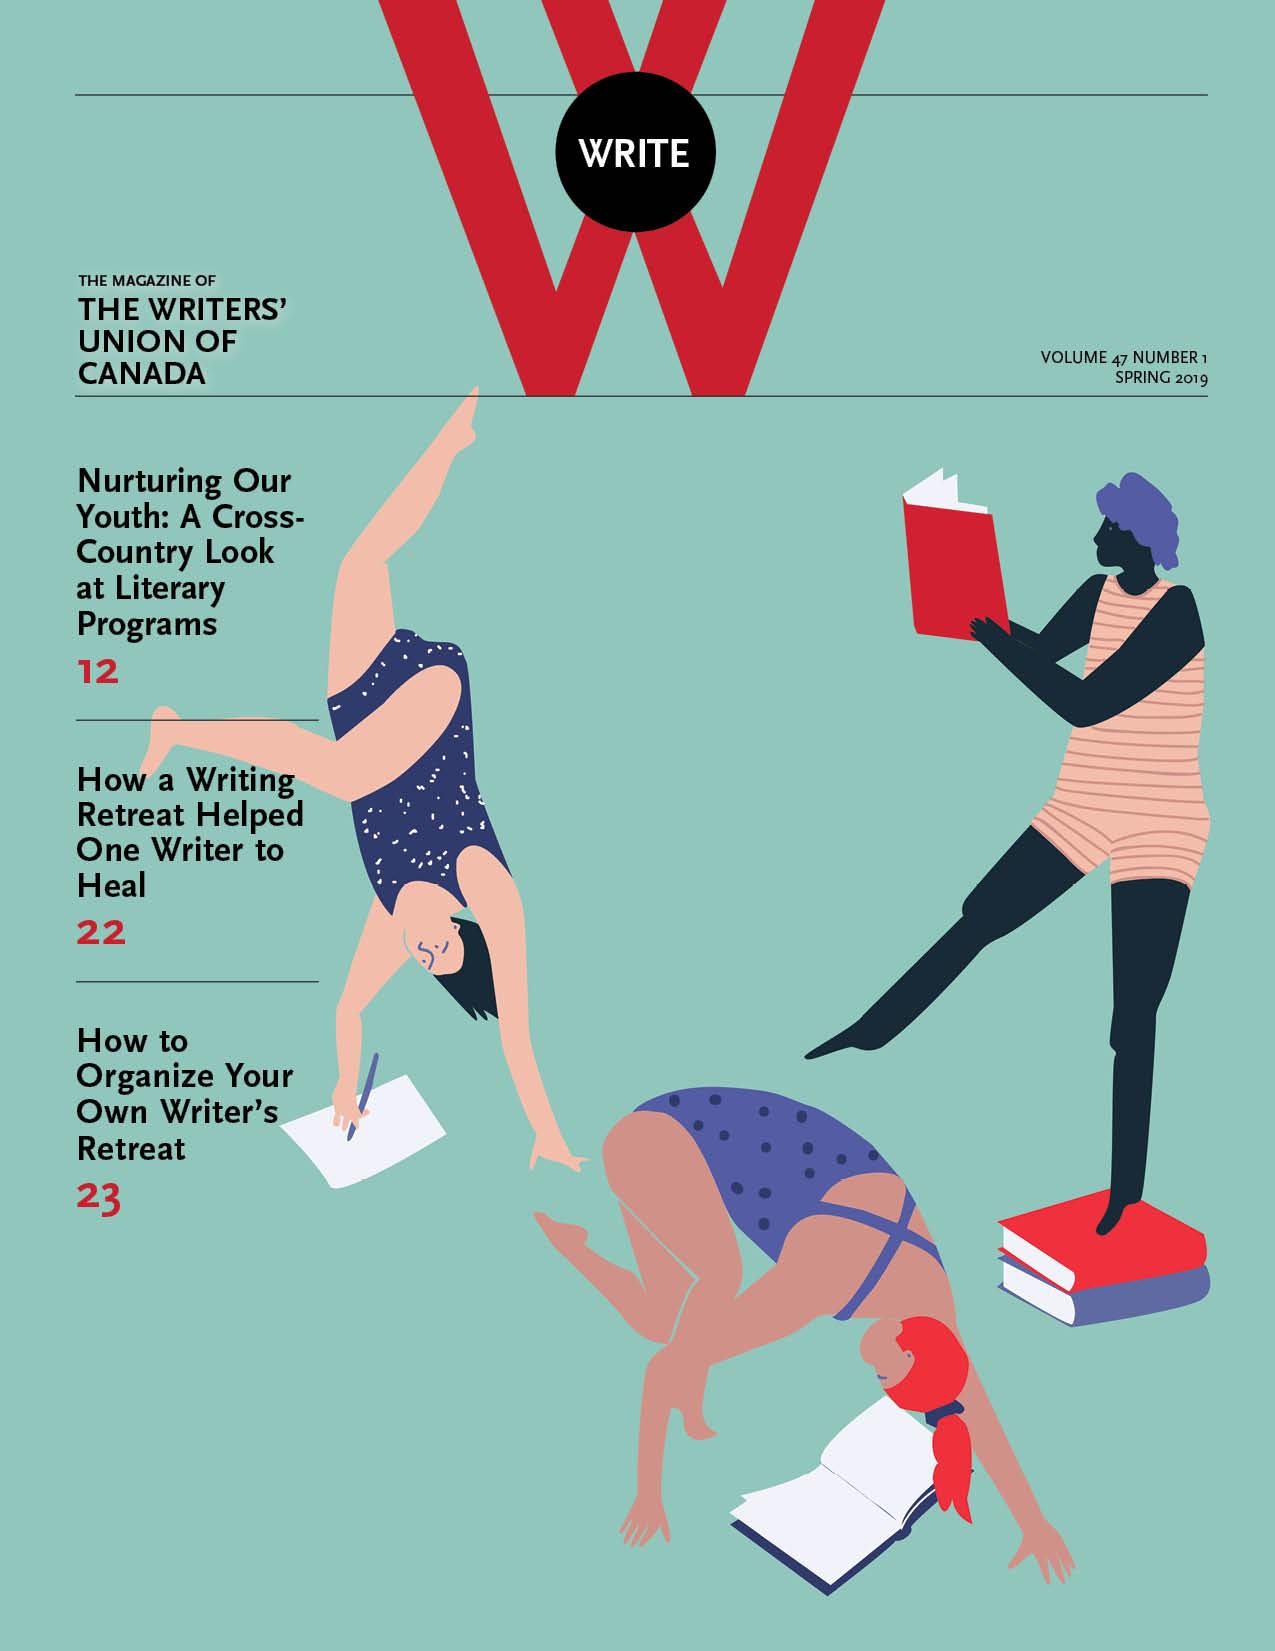 Write magazine | The Writers' Union of Canada